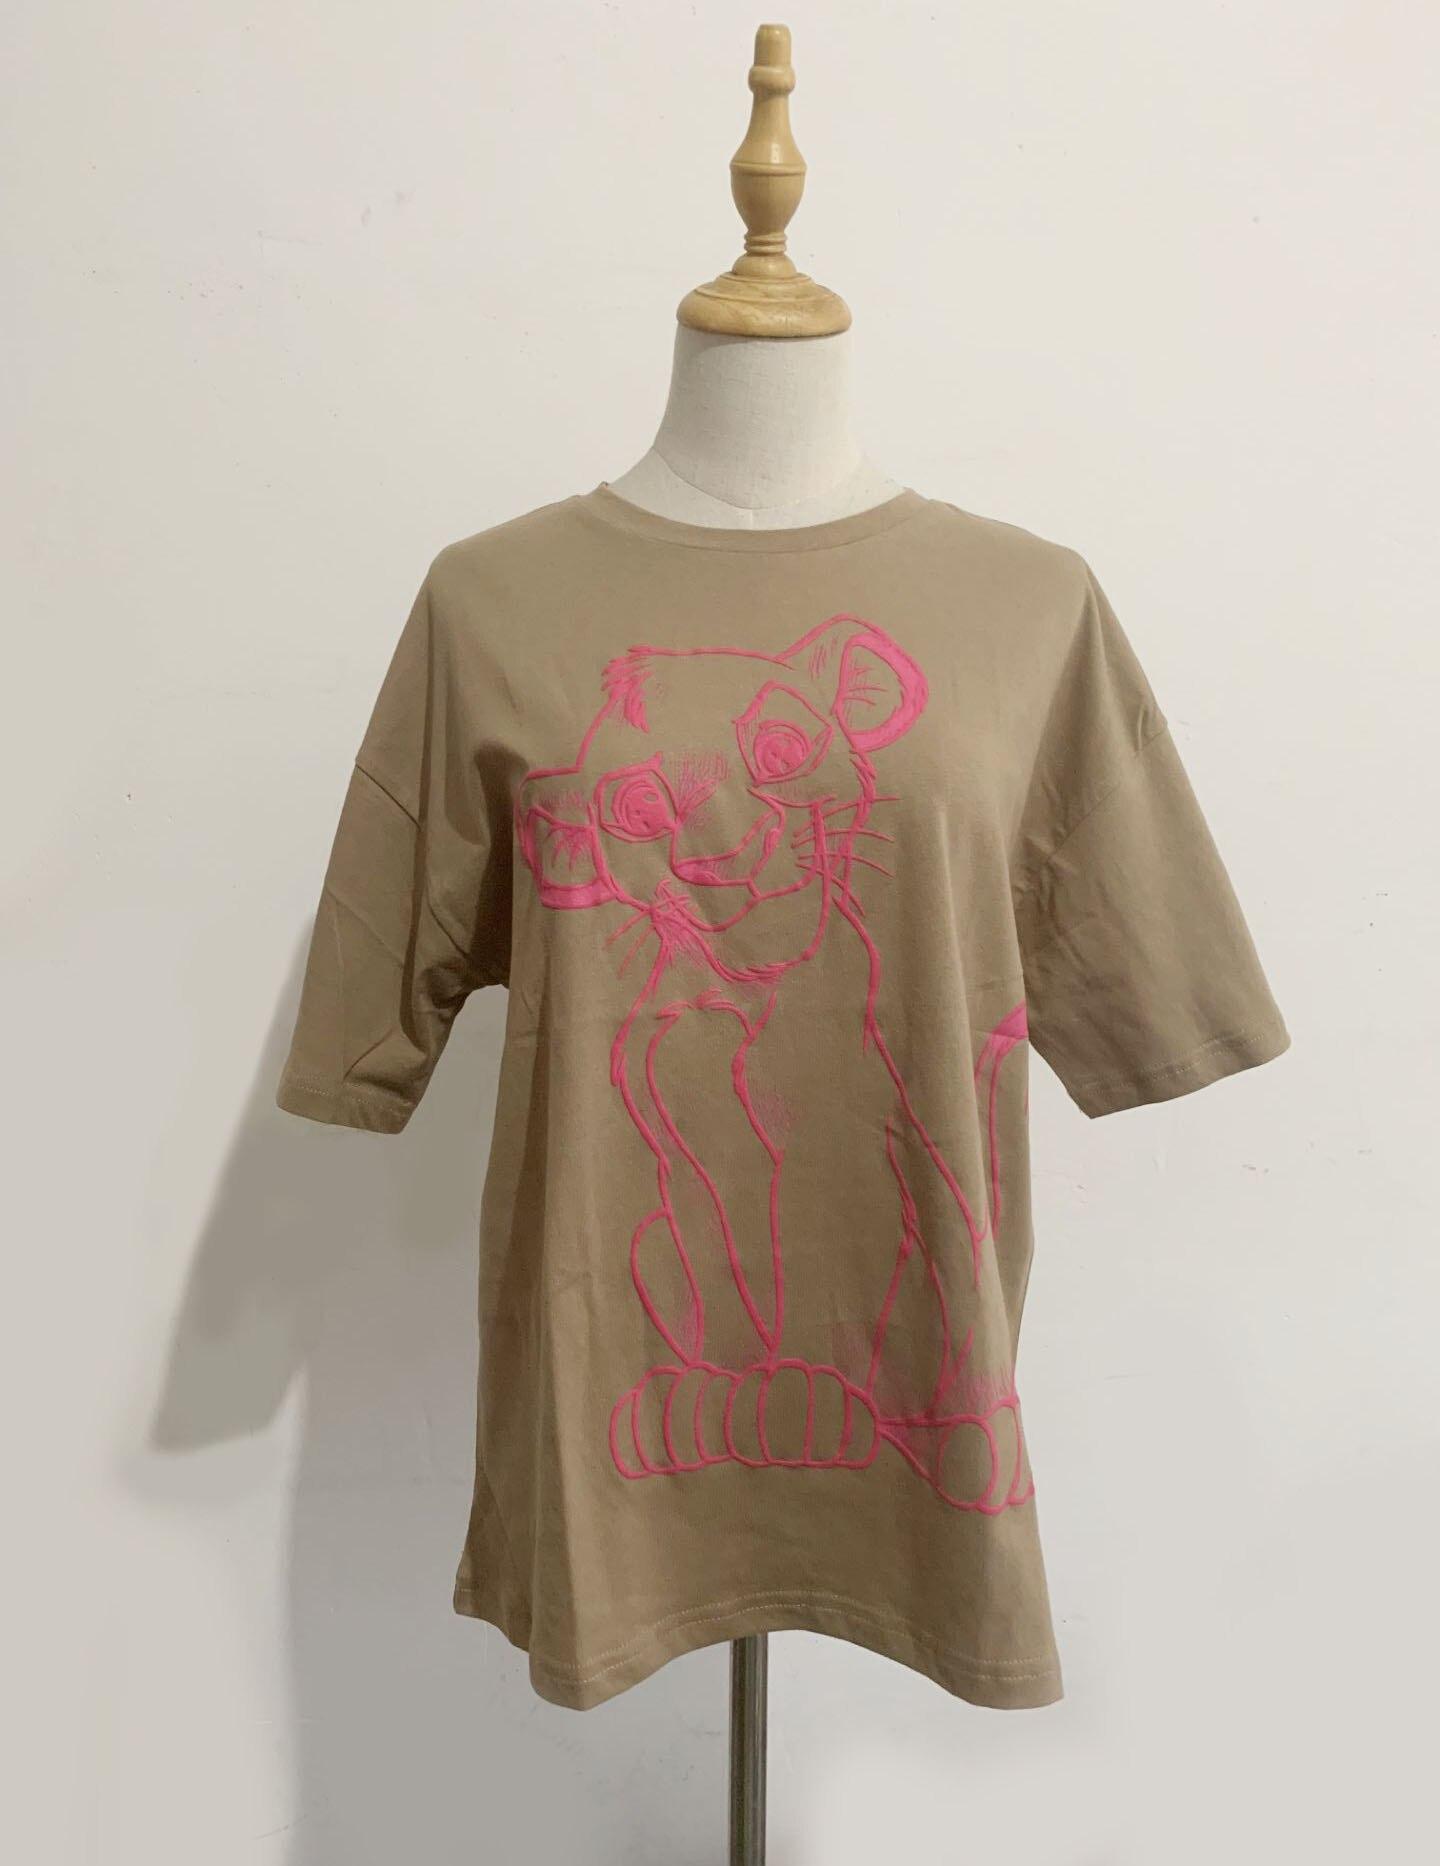 H184192cb7e234bd2a762ac9e2f4bfa8dC Disney Family T-Shirt Fashion Winnie the Pooh Mickey Mouse Stitch Fairy Dumbo SIMBA Cartoon Print Women T-Shirt Cotton Tee s